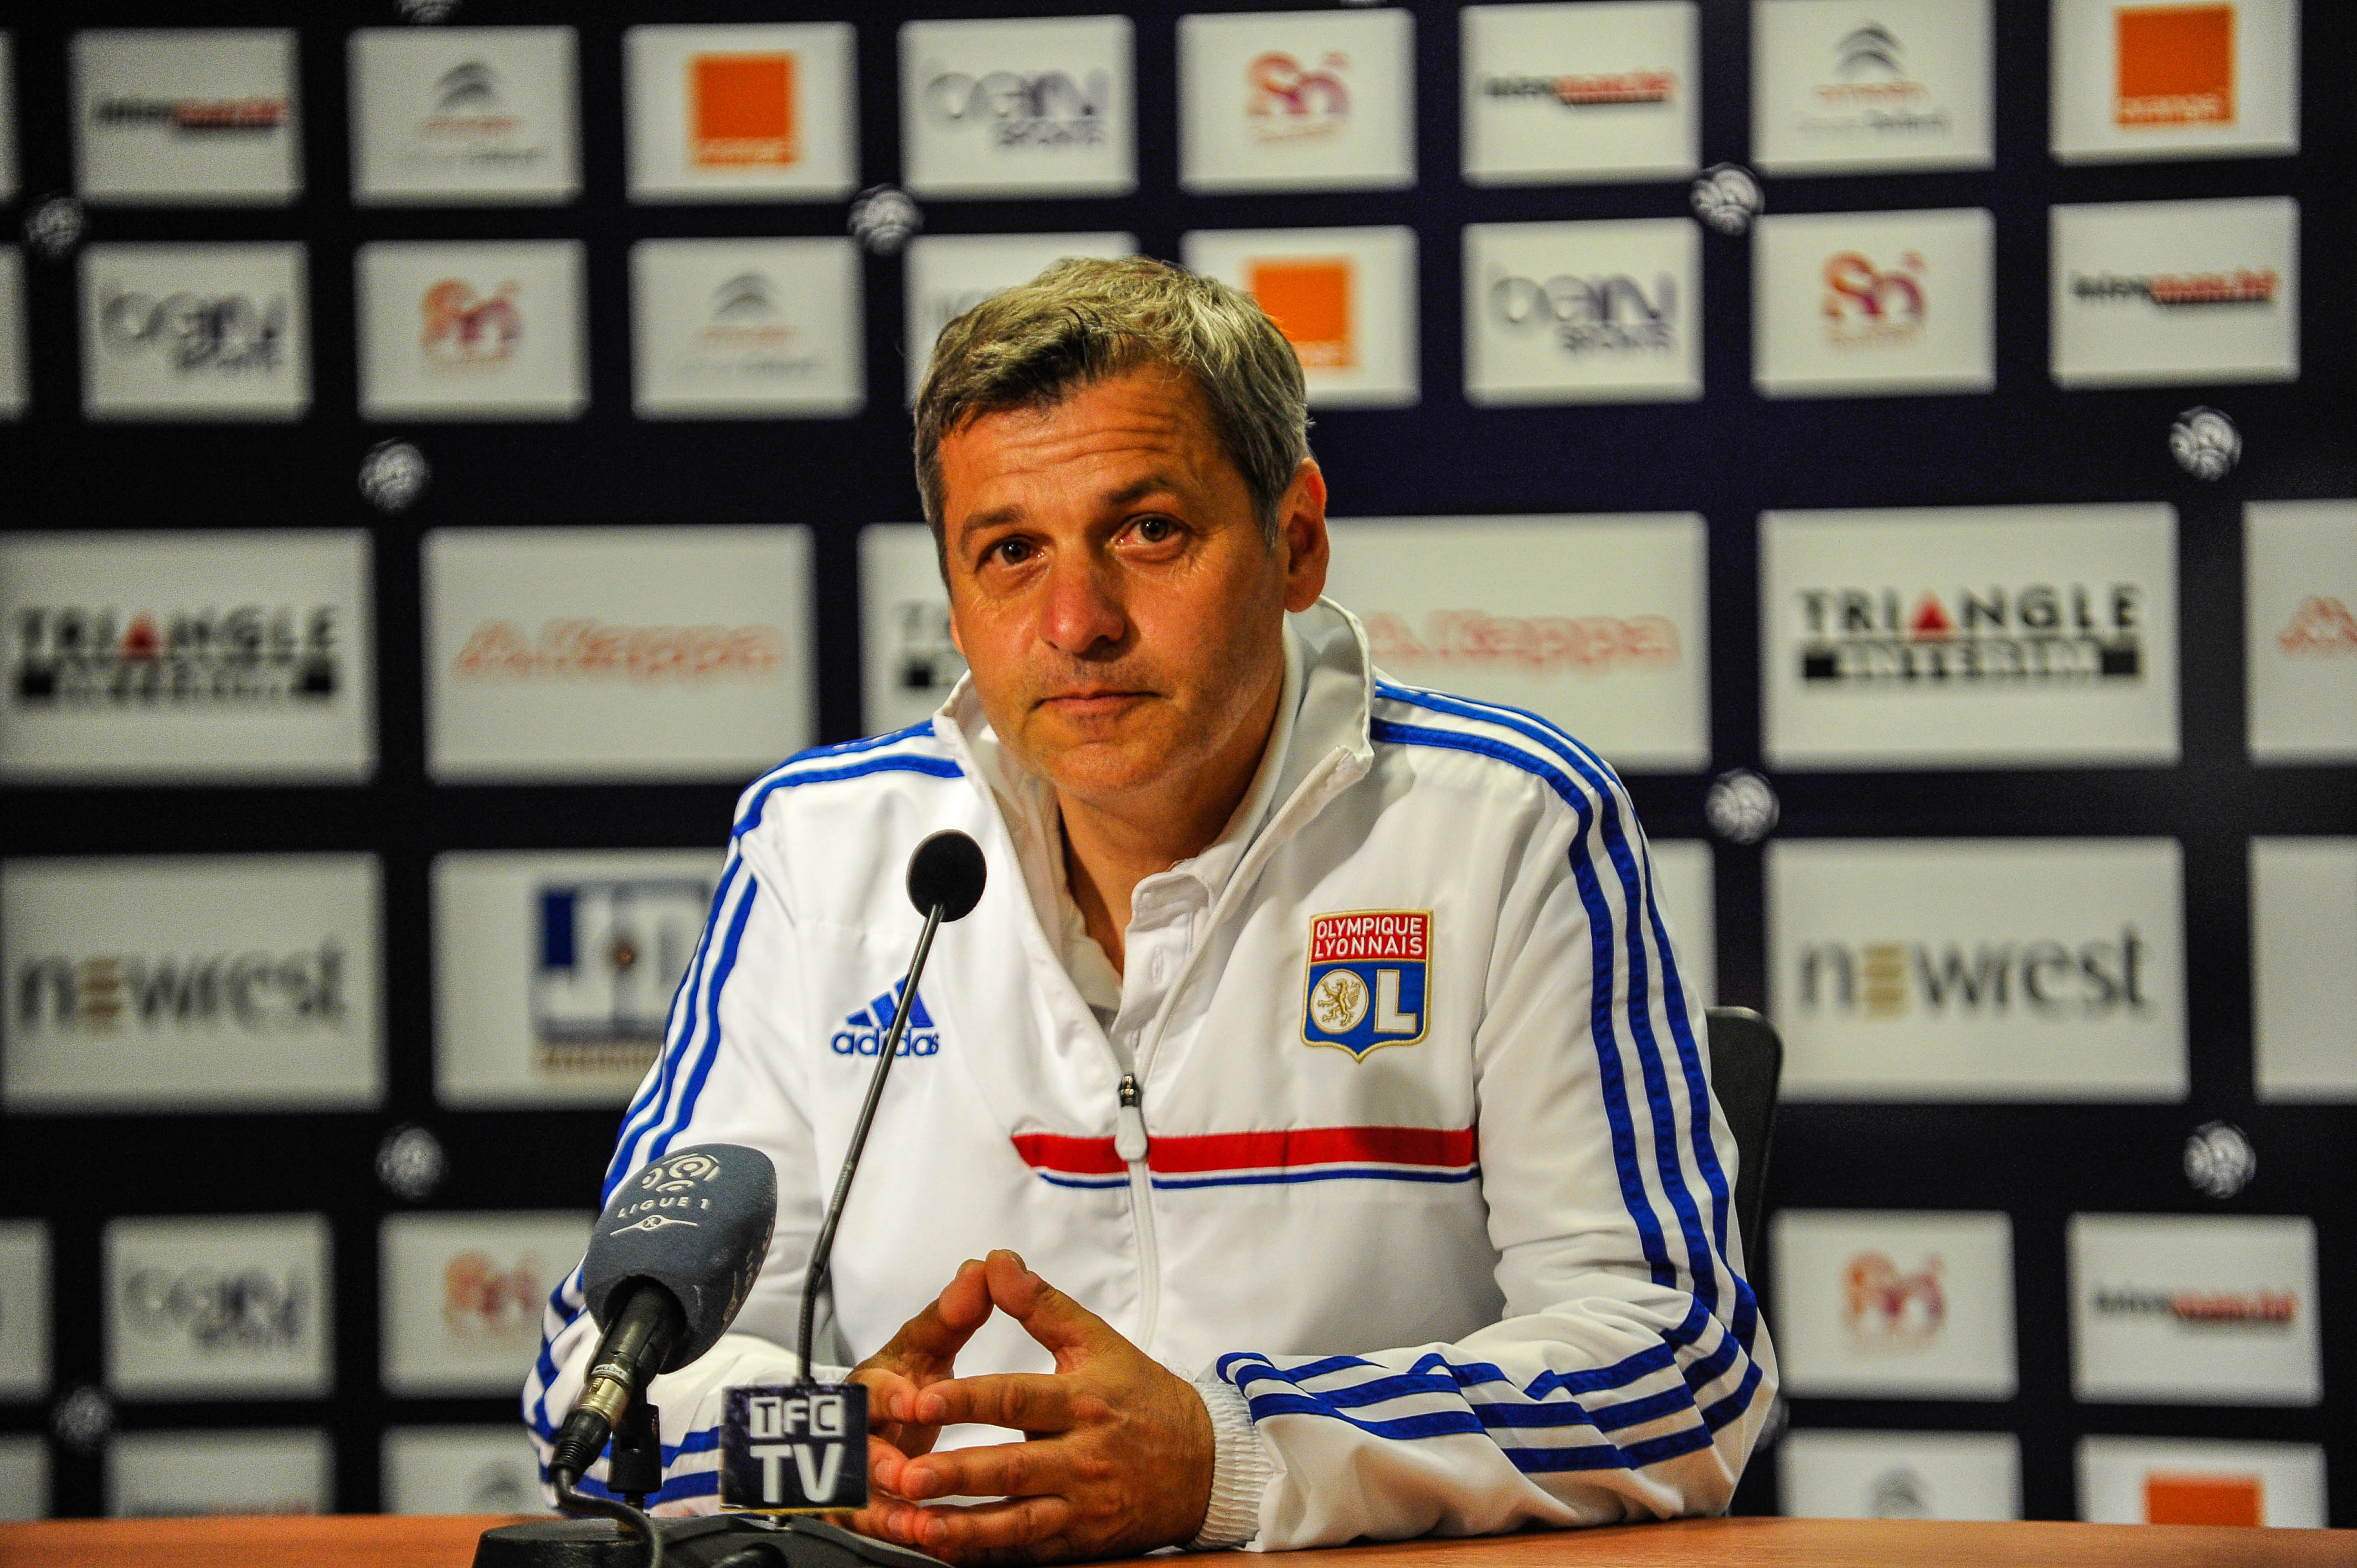 FOOTBALL : Toulouse vs Lyon - 34eme Journee de L1 - 23/04/2014